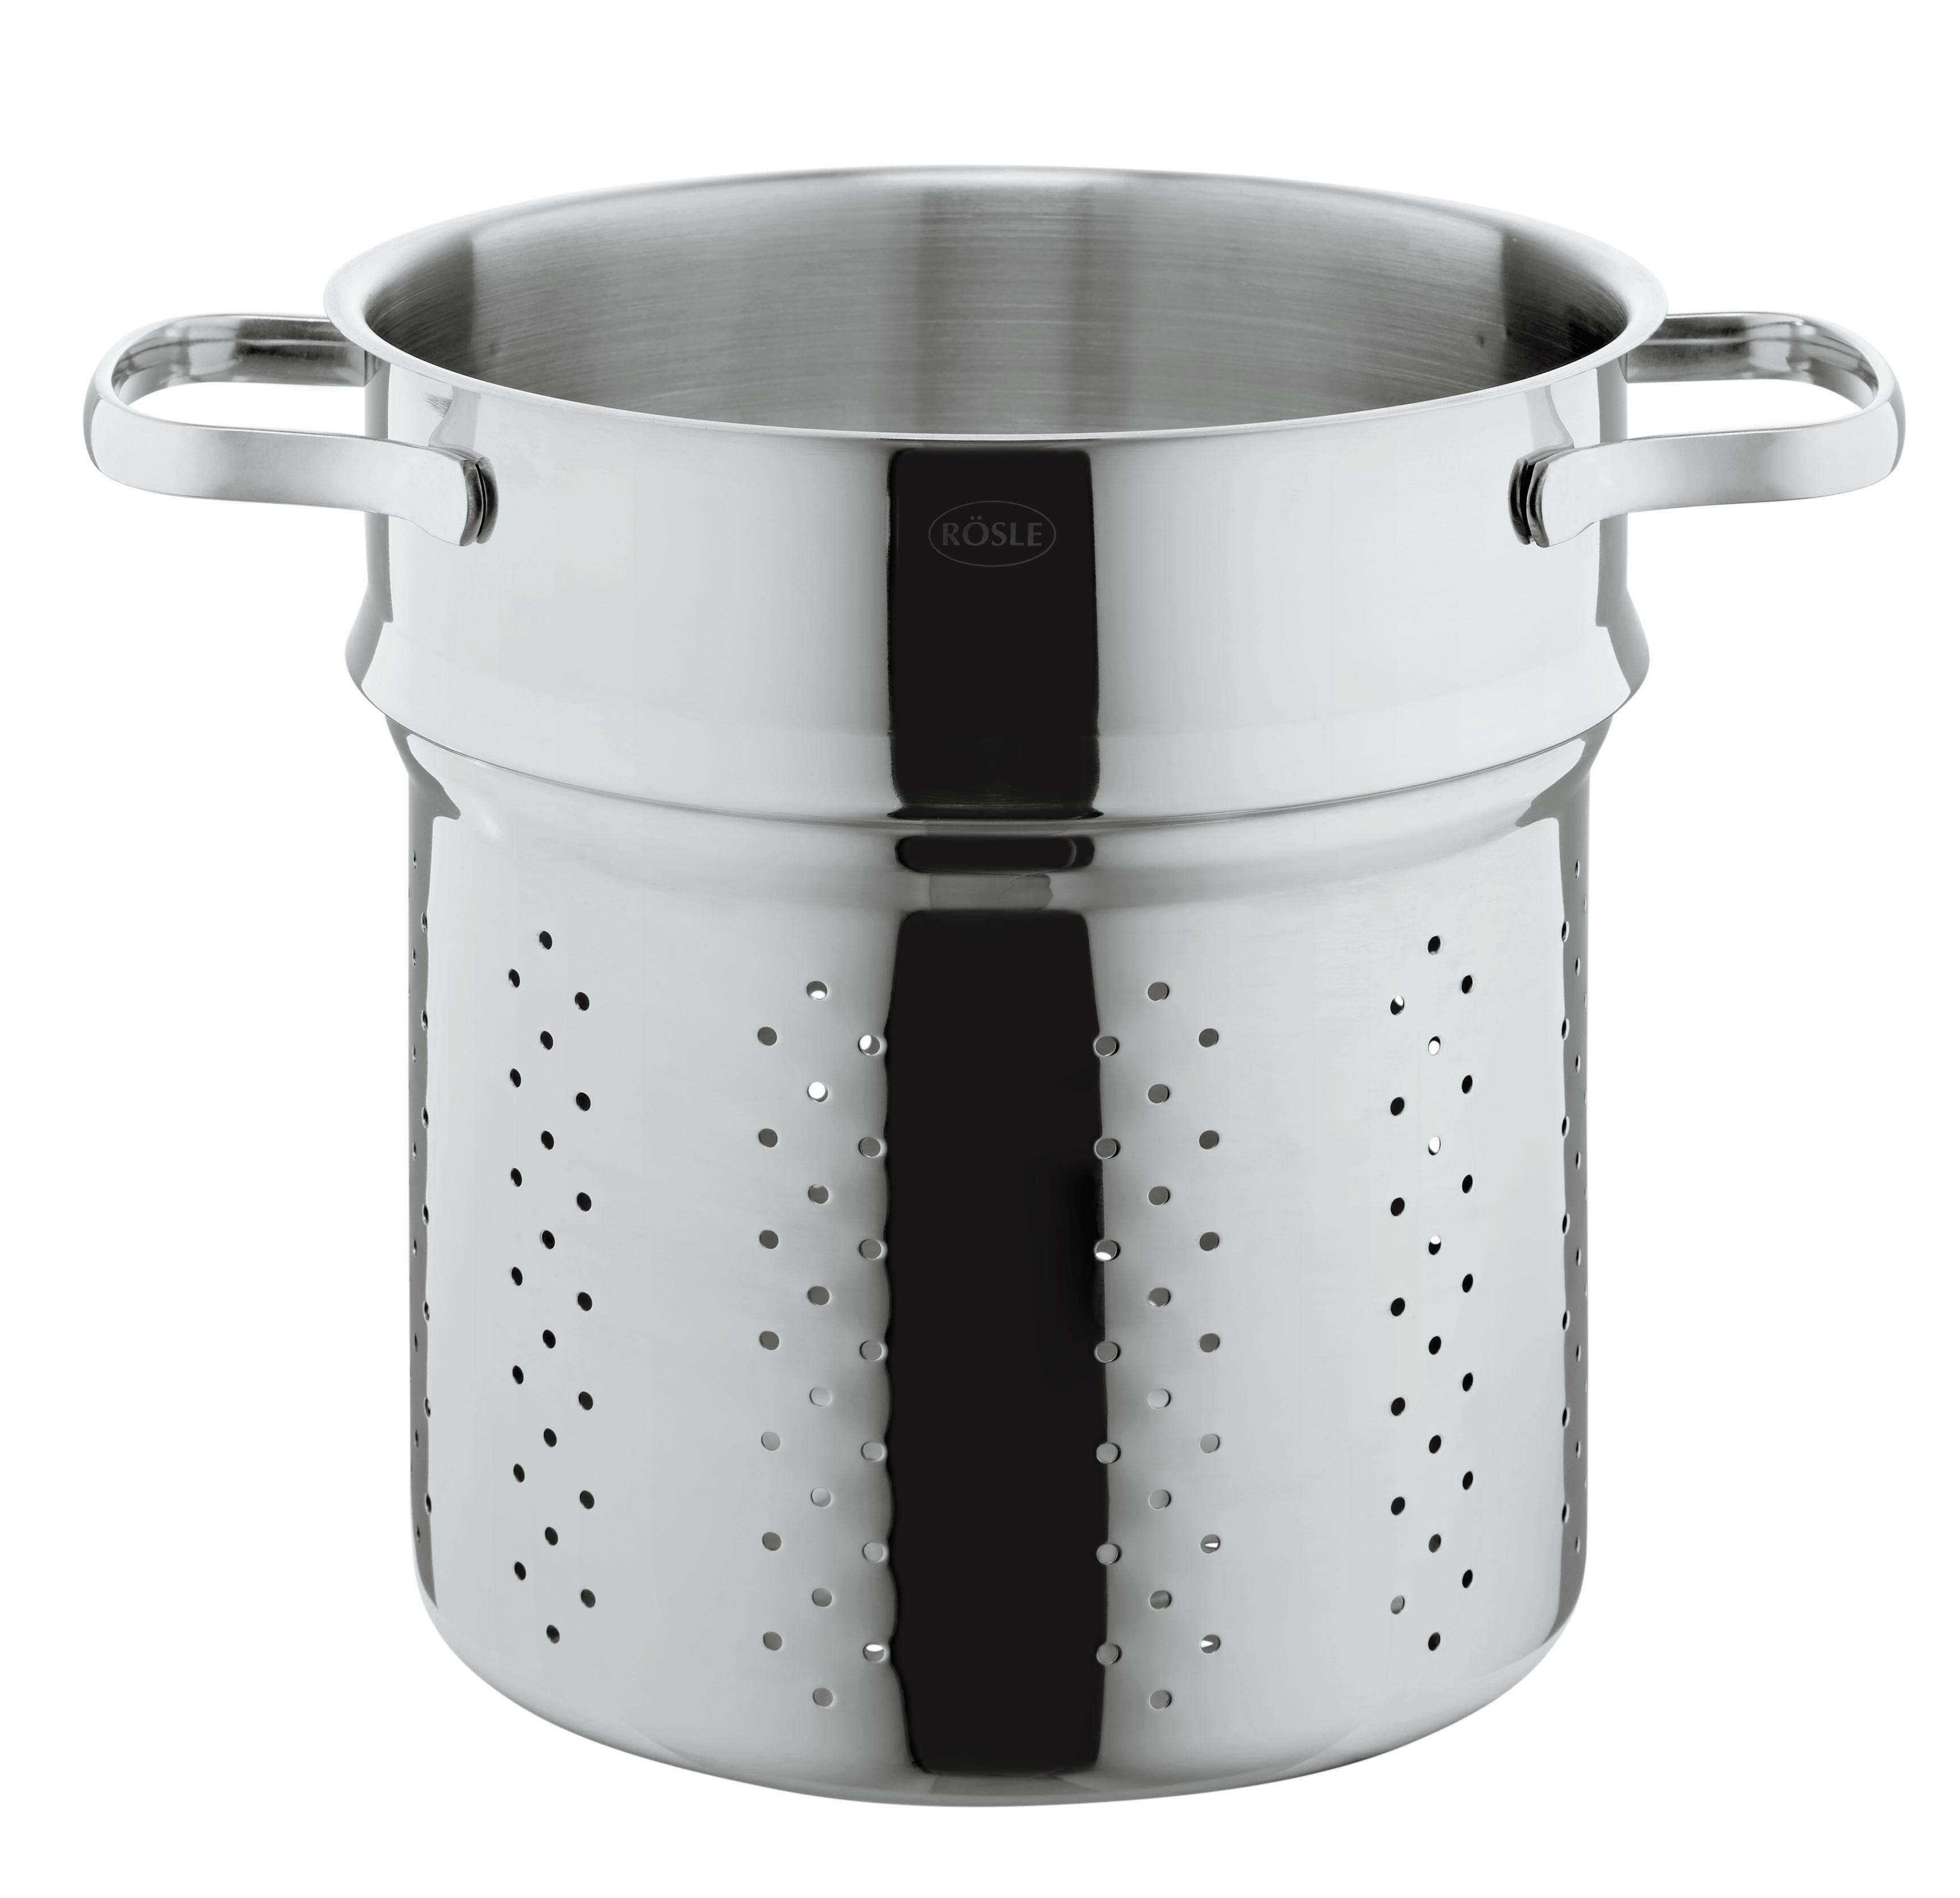 Pastatopf Rösle - Edelstahlfarben, KONVENTIONELL, Glas/Metall (22/22/30cm) - RÖSLE